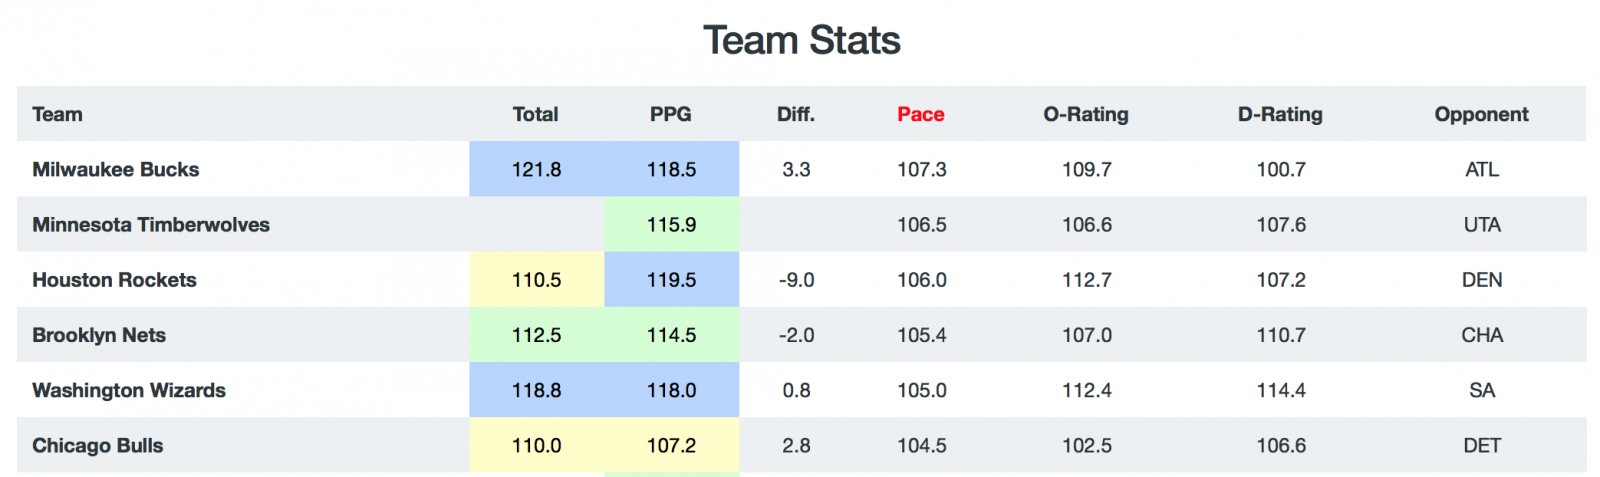 NBA Game Breakdown - Pace